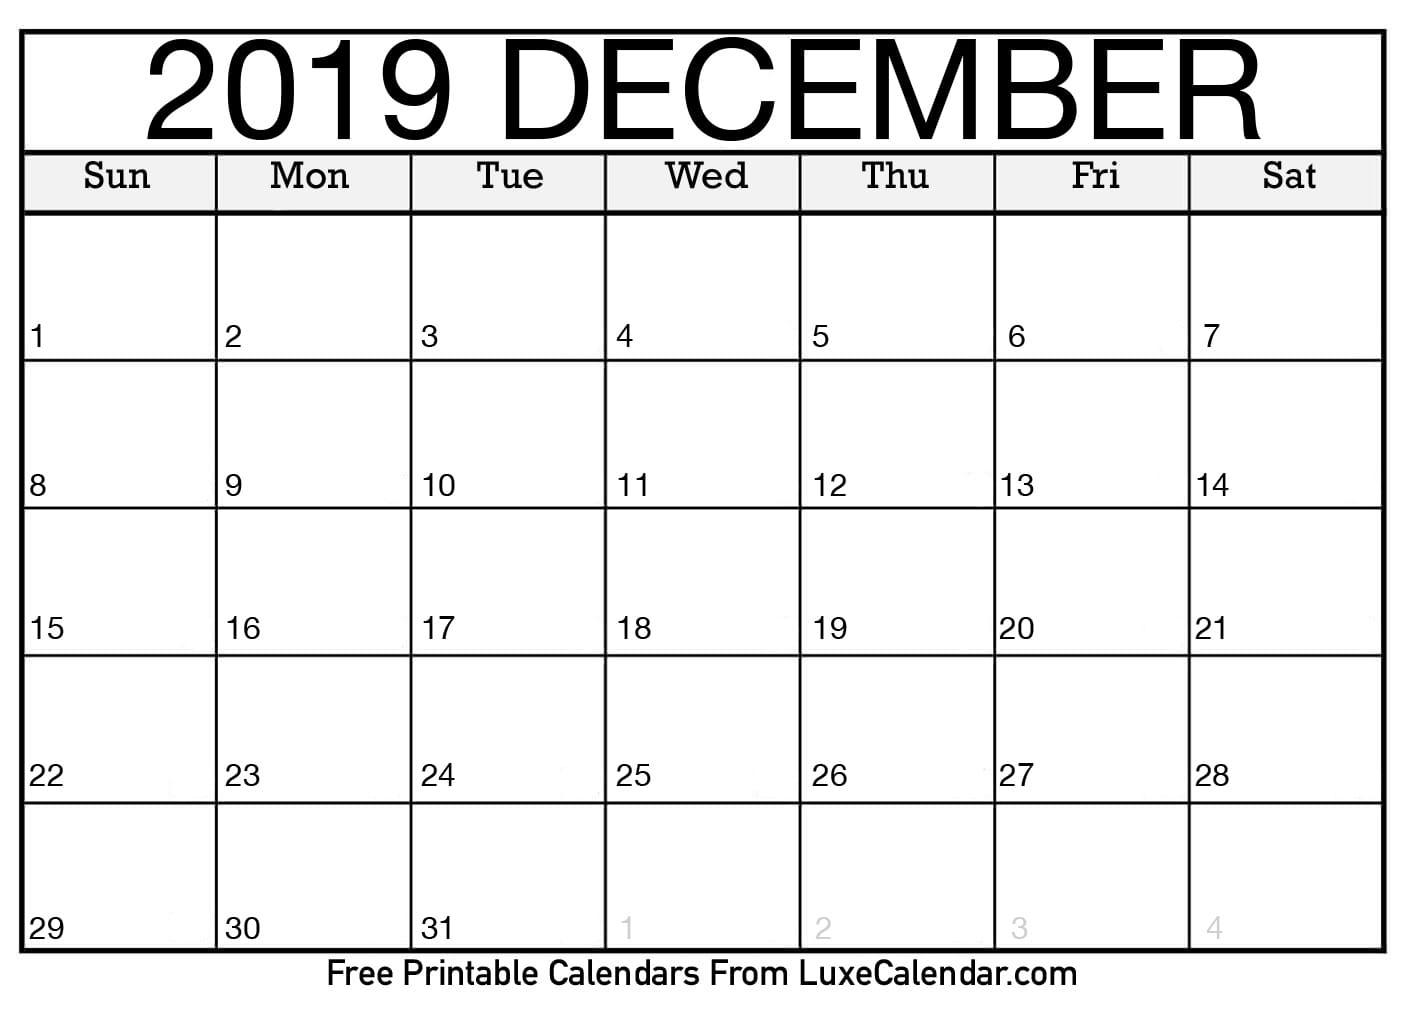 Blank December 2019 Calendar Printable - Luxe Calendar within Blank Calendars December Printable